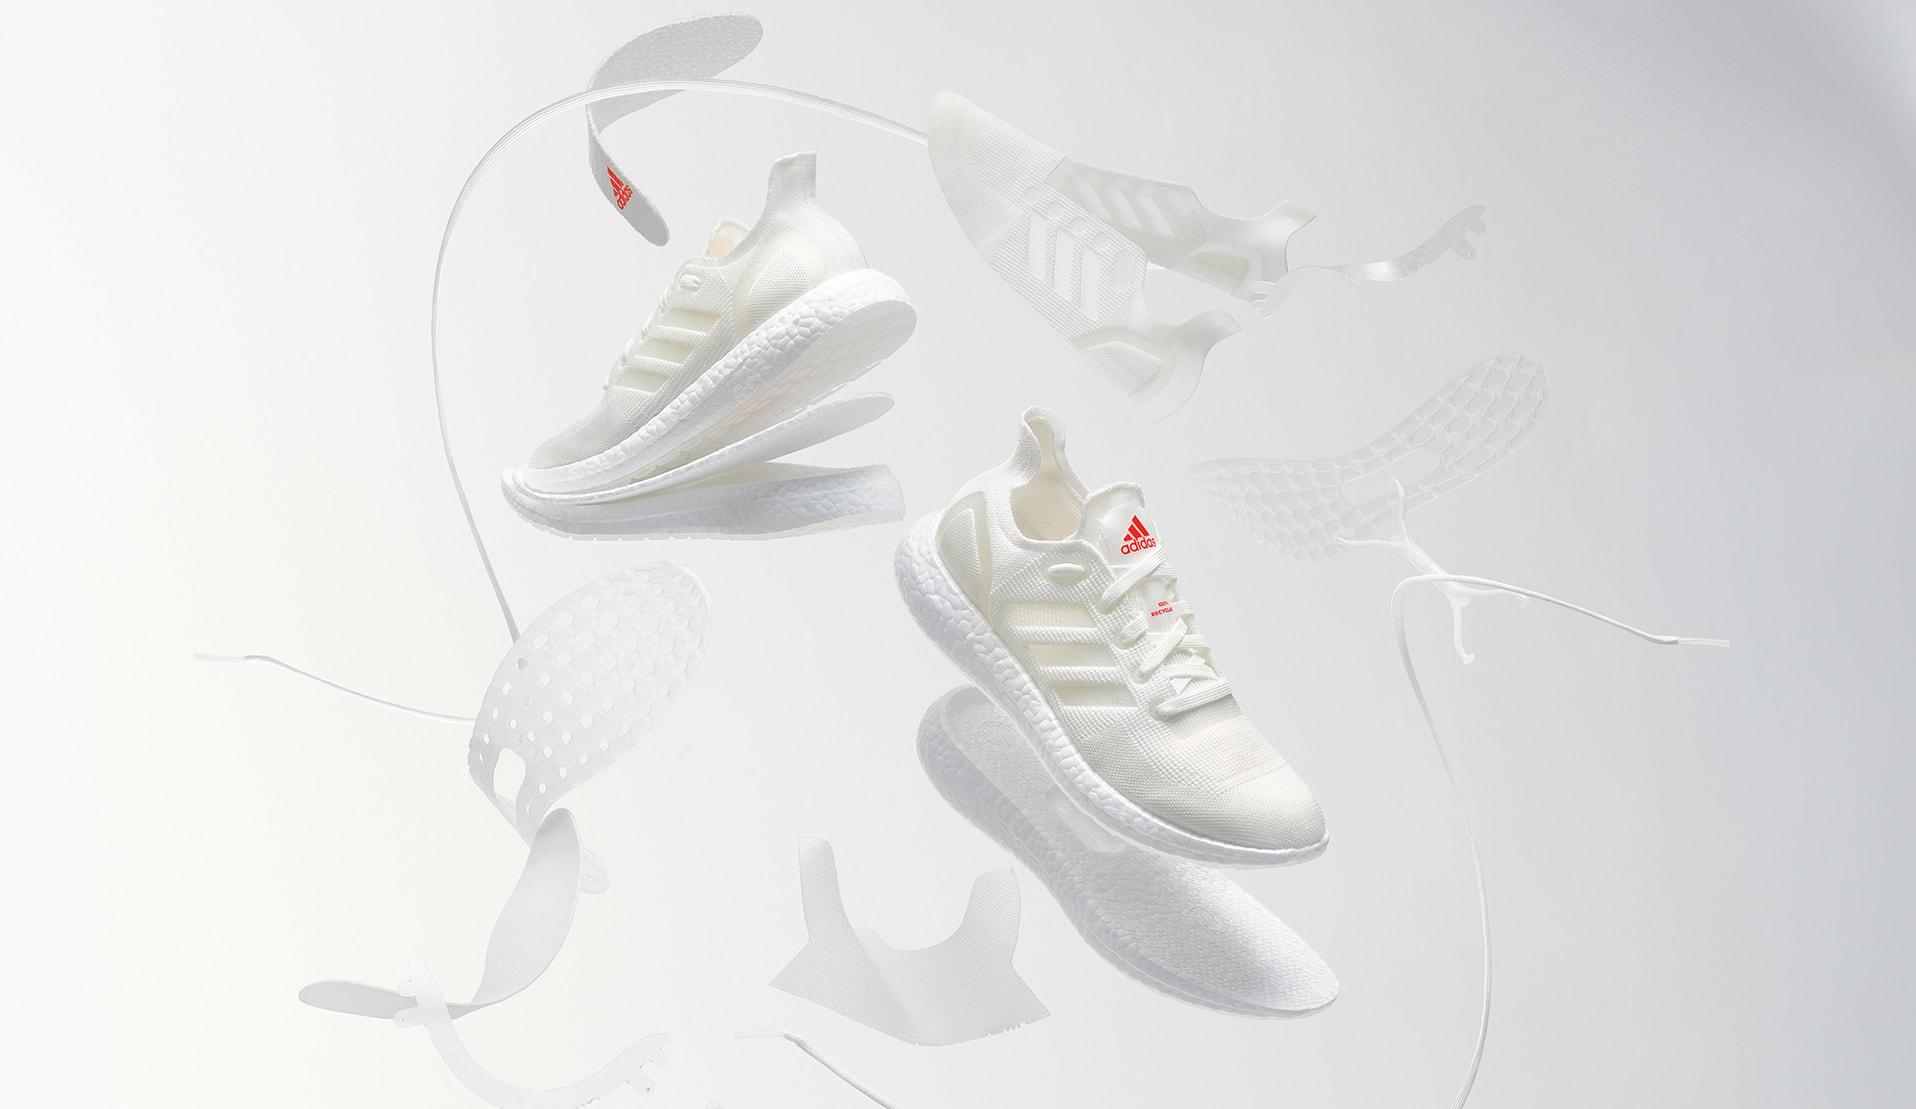 Adidas Futurecraft.Loop 3